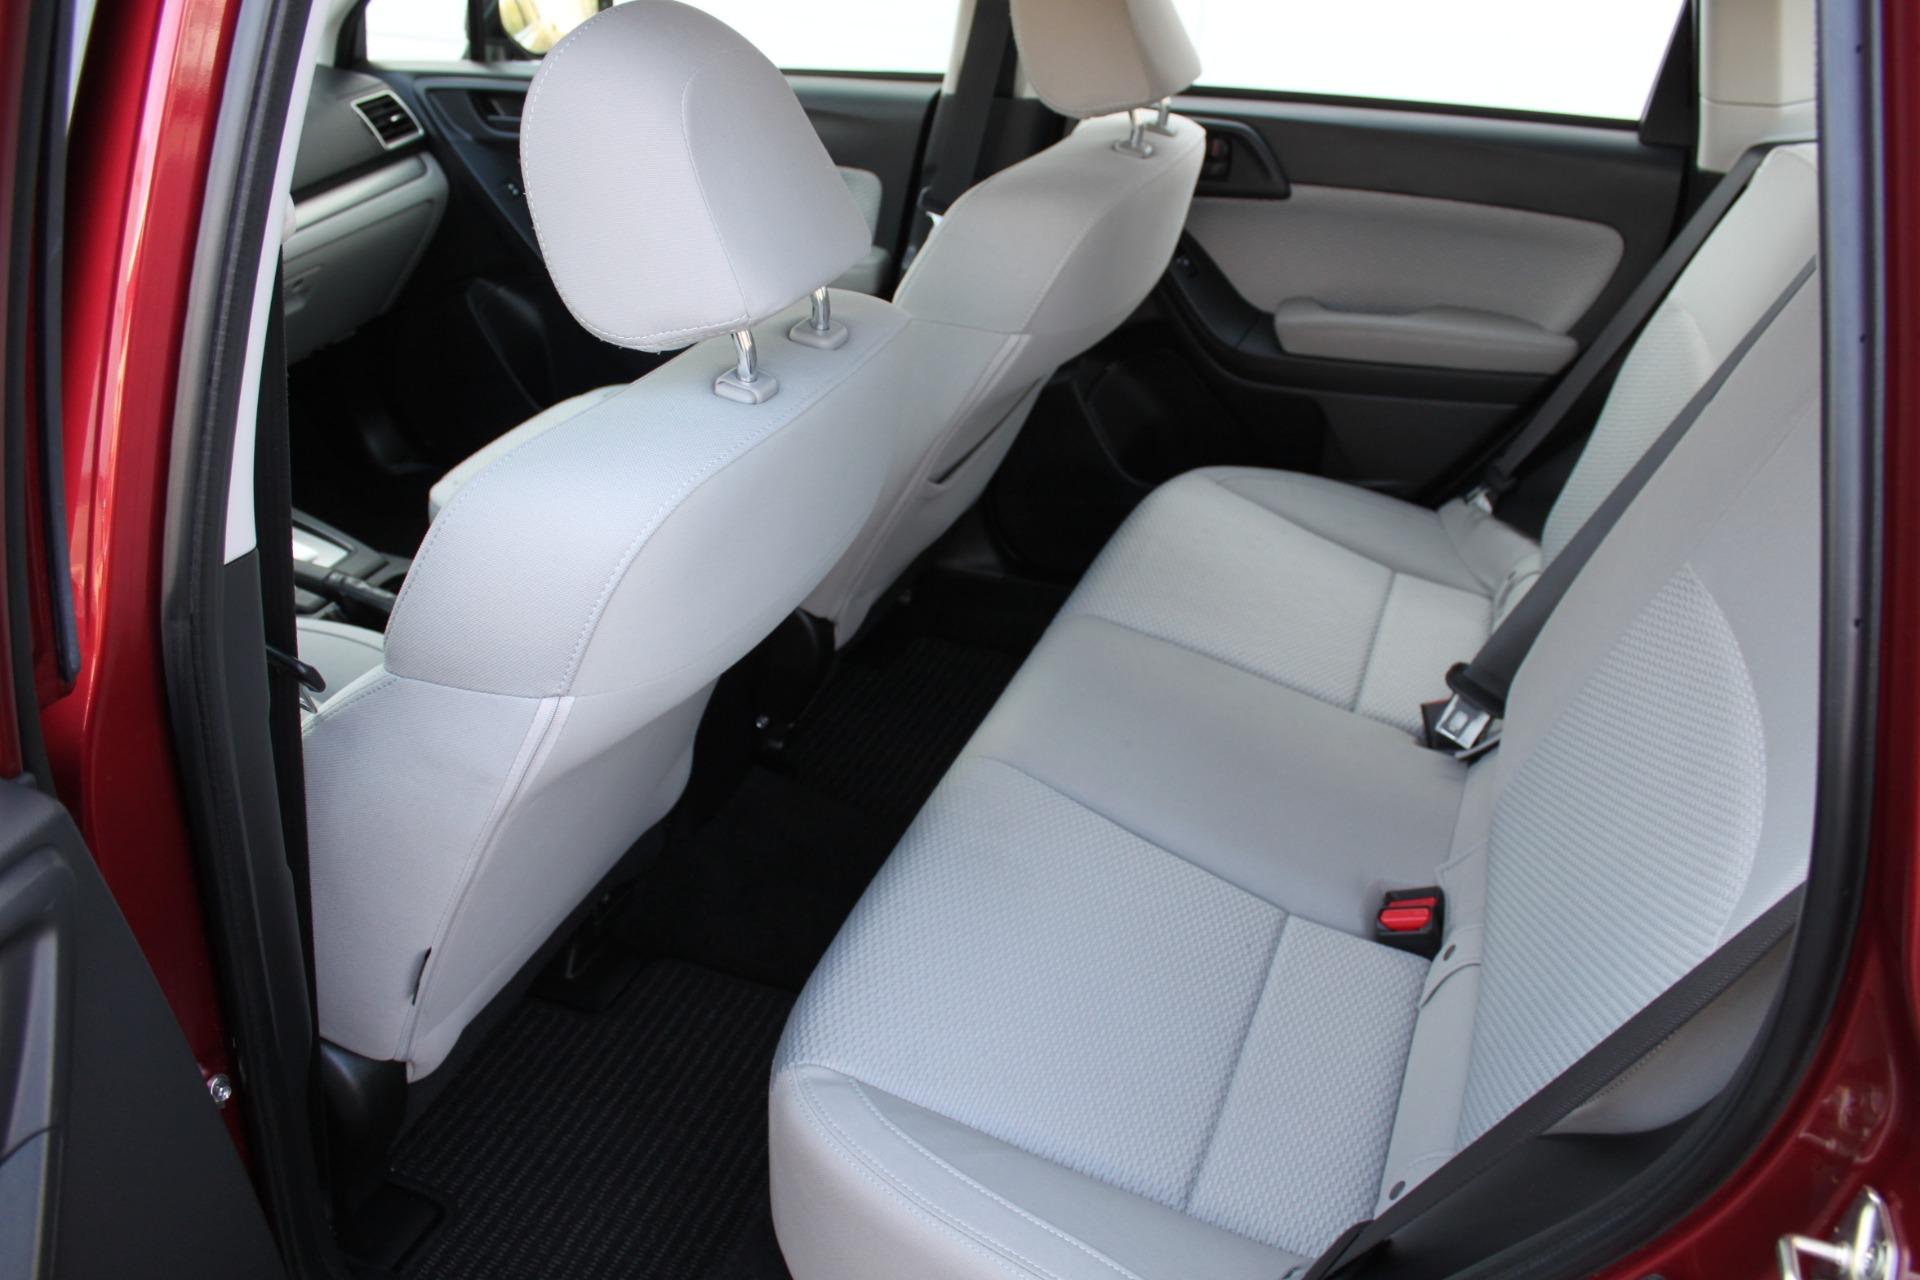 Used-2017-Subaru-Forester-25i-All-Wheel-Drive-25i-4X4